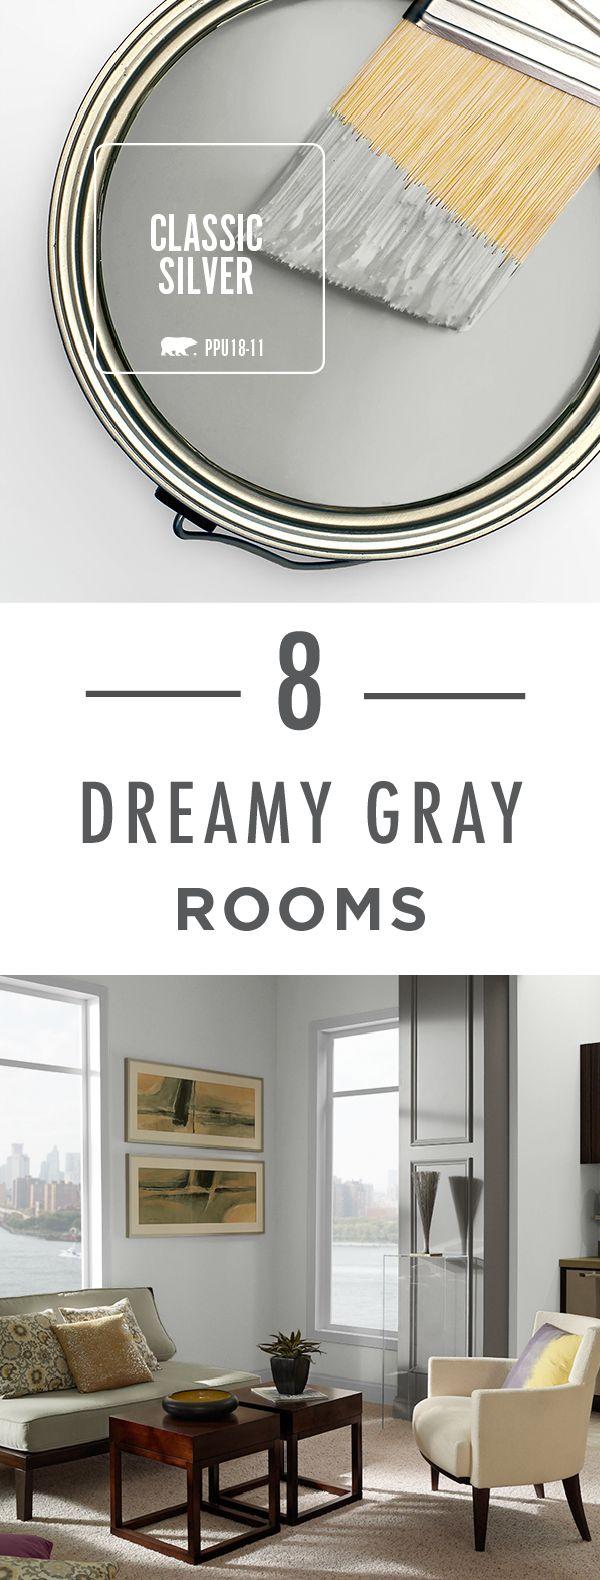 Best 25 Unique Bedroom Furniture Ideas On Pinterest Mid Century Bedroom West Elm Bedroom And